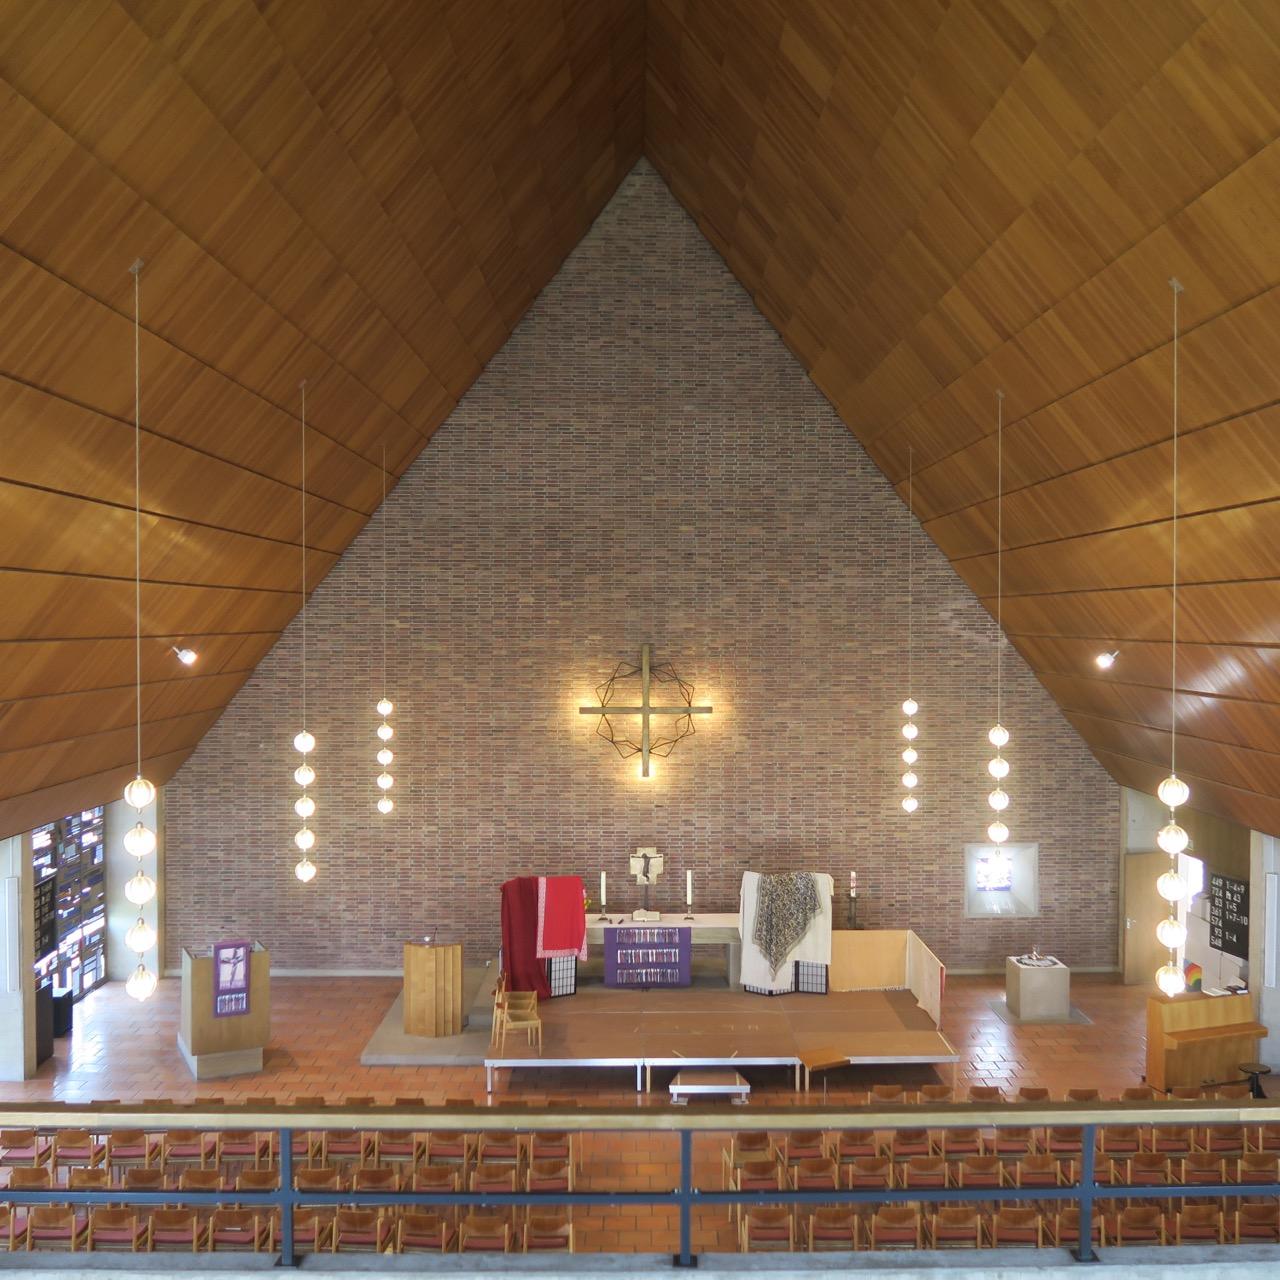 Matthäuskirche, Innenansicht